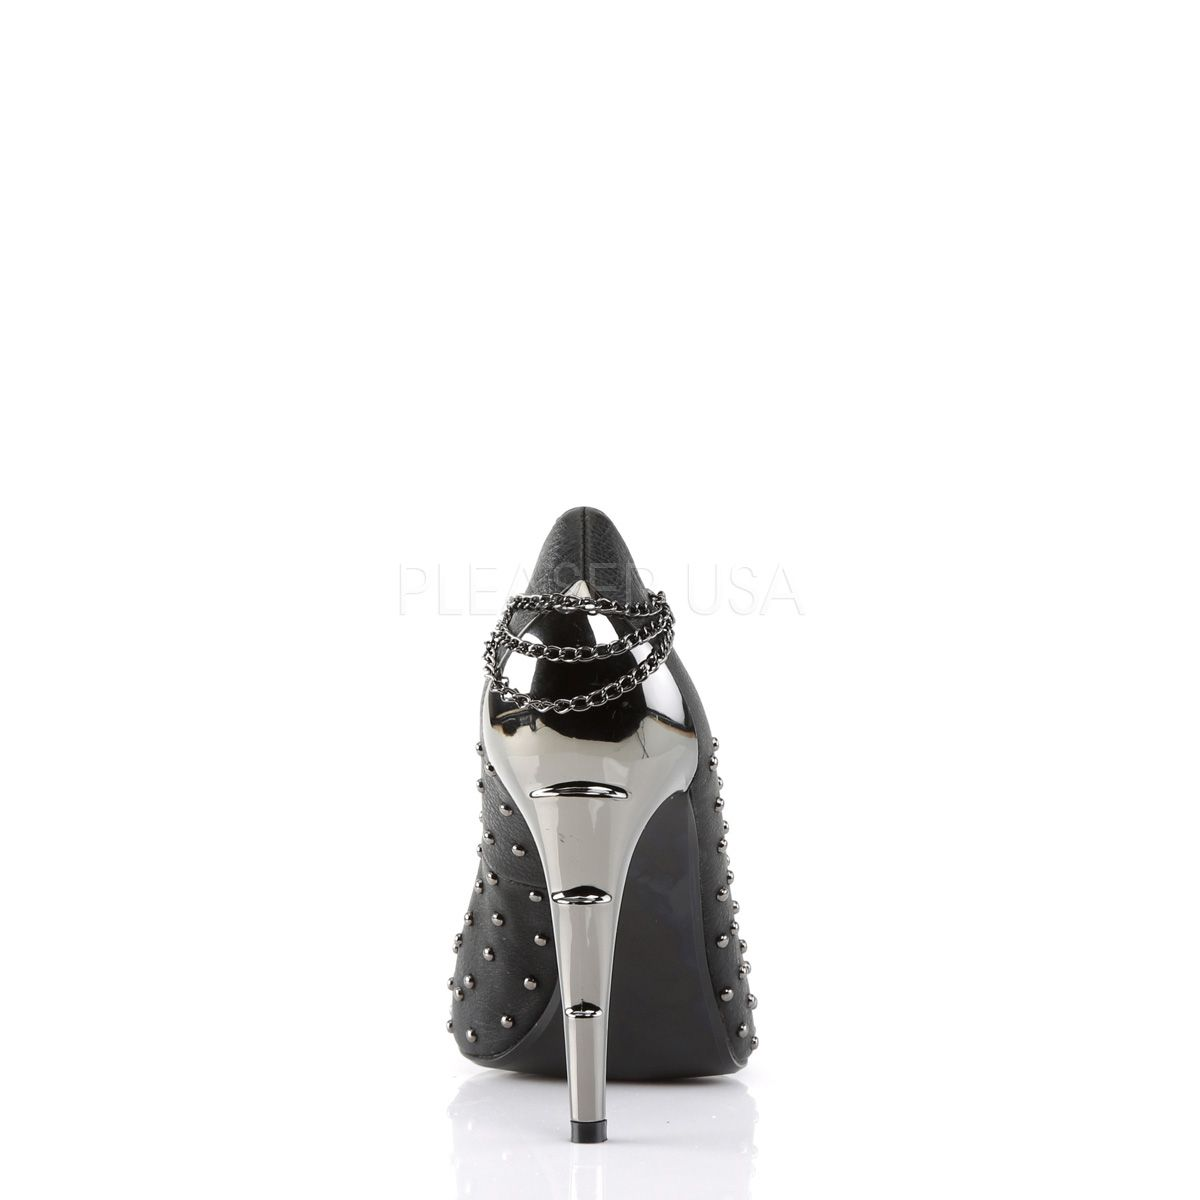 Sapato Voltage 08 Spikes - Demonia (encomenda)